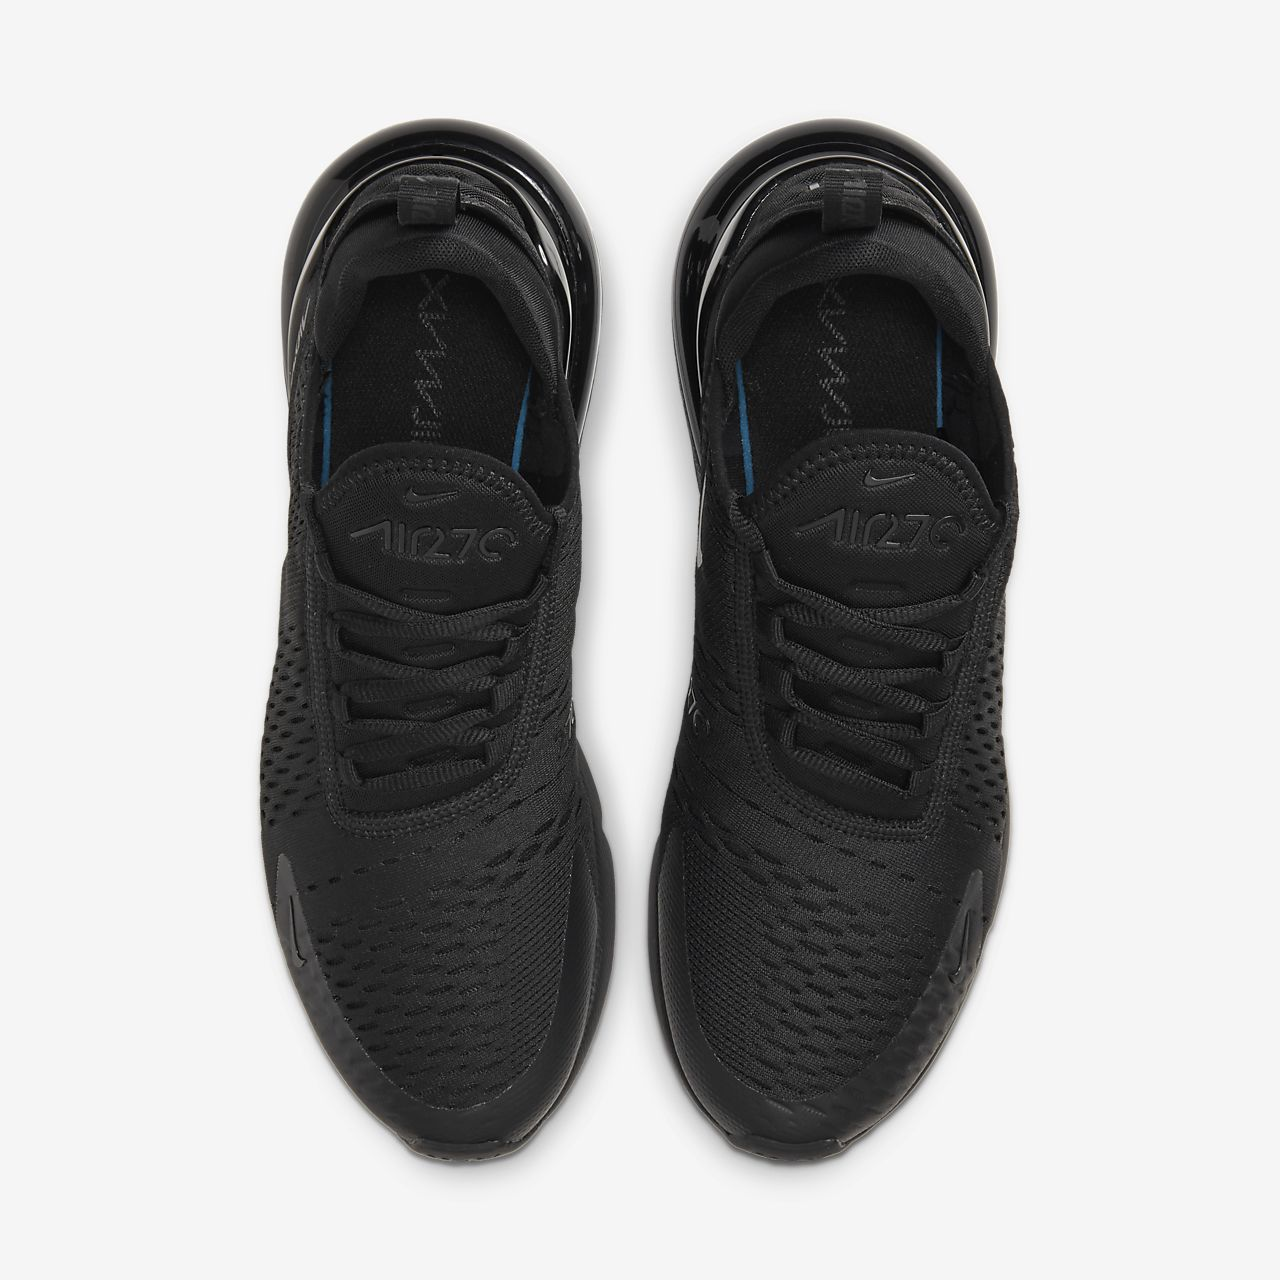 1b6b6fd5 Мужские кроссовки Nike Air Max 270. Nike.com RU